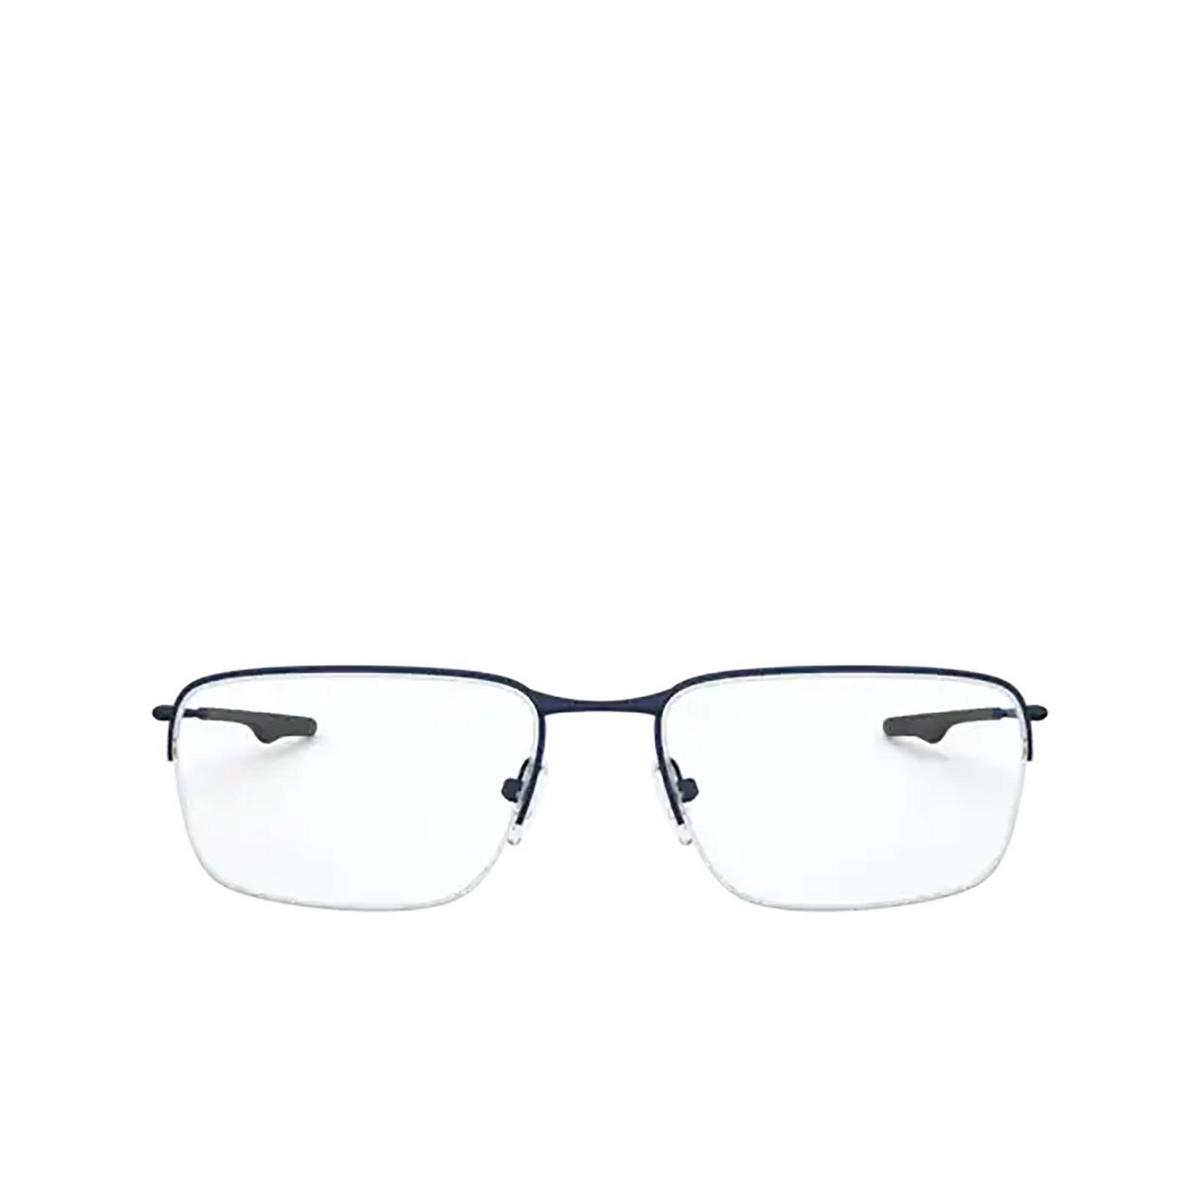 Oakley® Rectangle Eyeglasses: Wingback Sq OX5148 color Matte Dark Navy 514804.